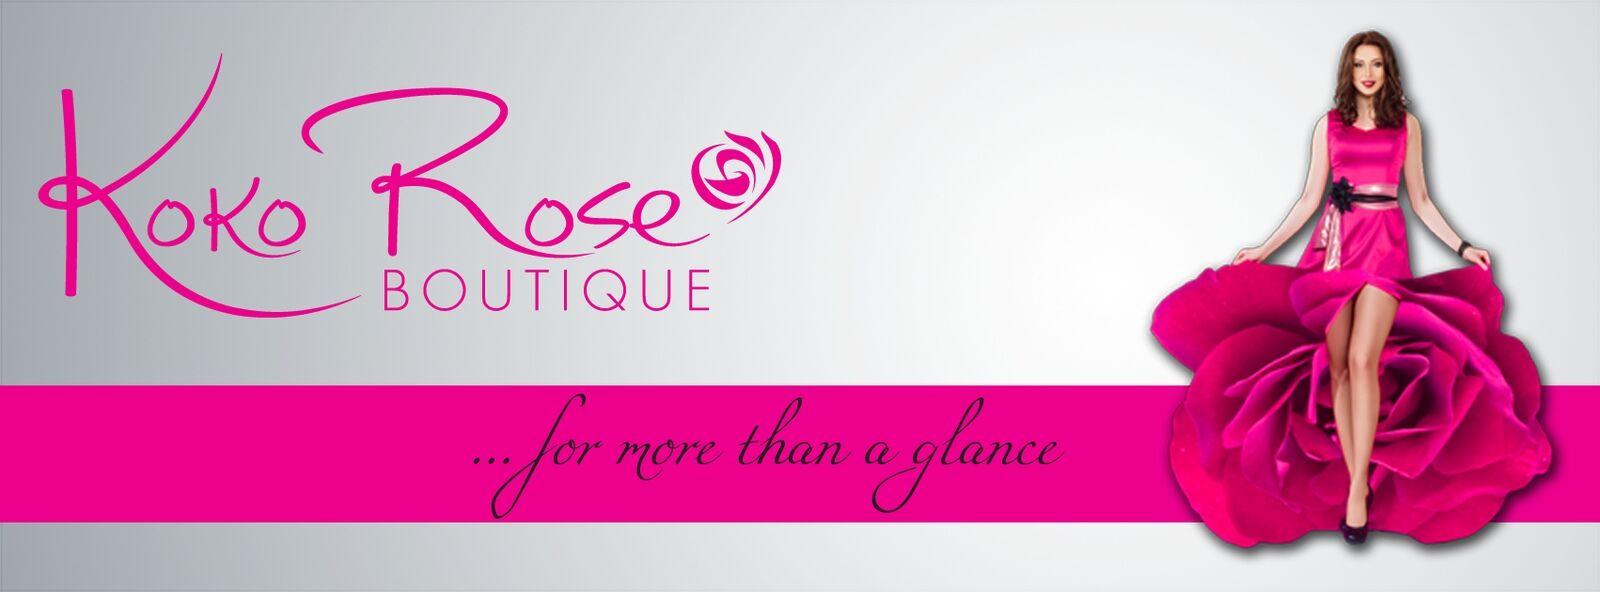 KOKO ROSE BOUTIQUE